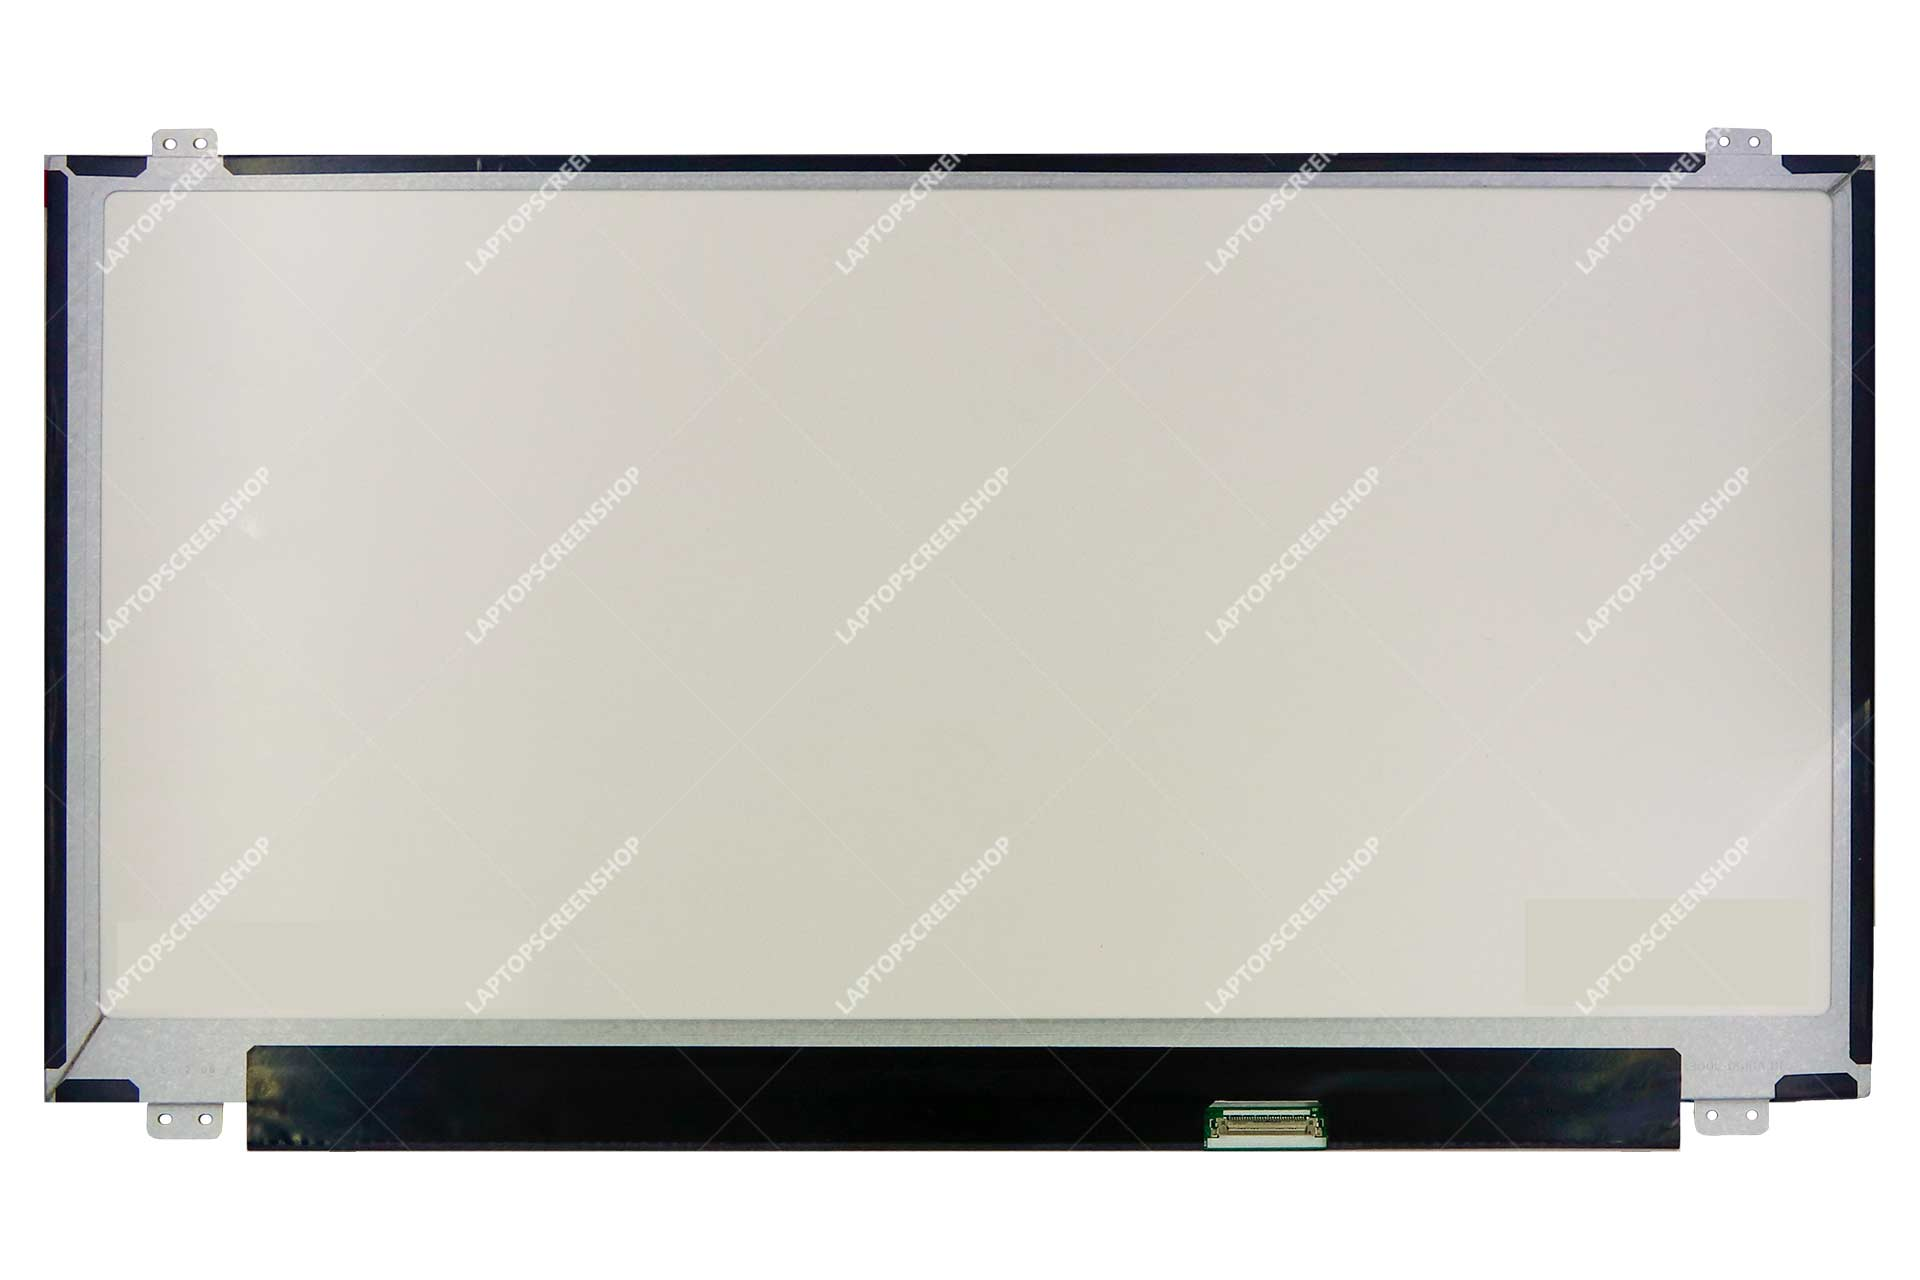 ACER-ASPIRE-E1-510-2683-LCD  HD فروشگاه لپ تاپ اسکرين   تعمير لپ تاپ